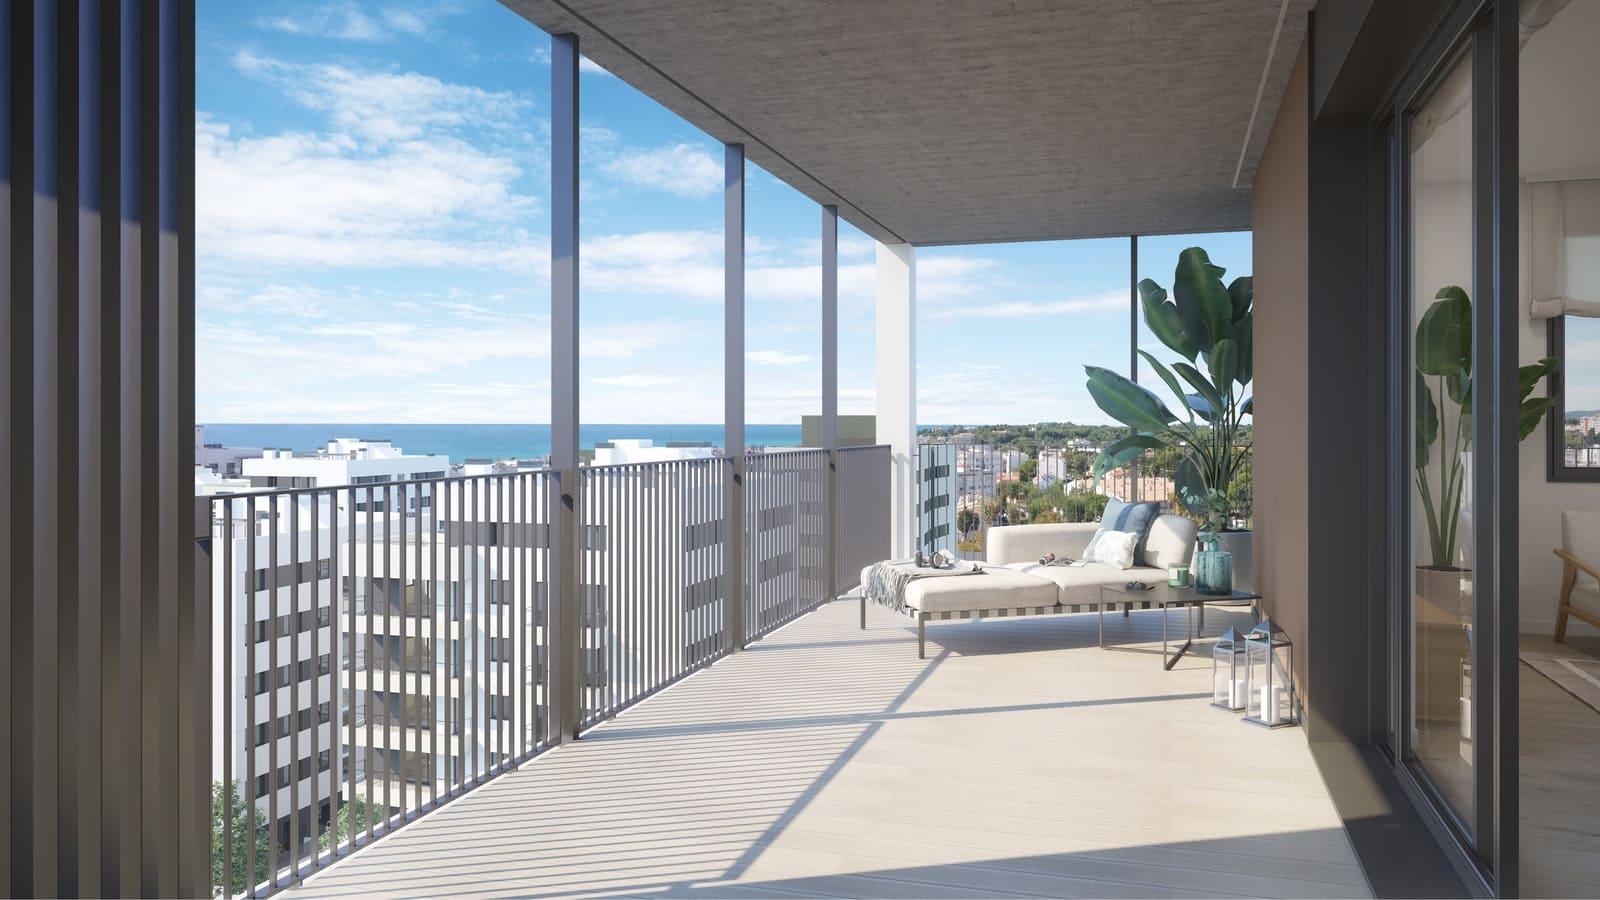 2 bedroom Apartment for sale in Vilanova i la Geltru with pool - € 229,000 (Ref: 5931474)